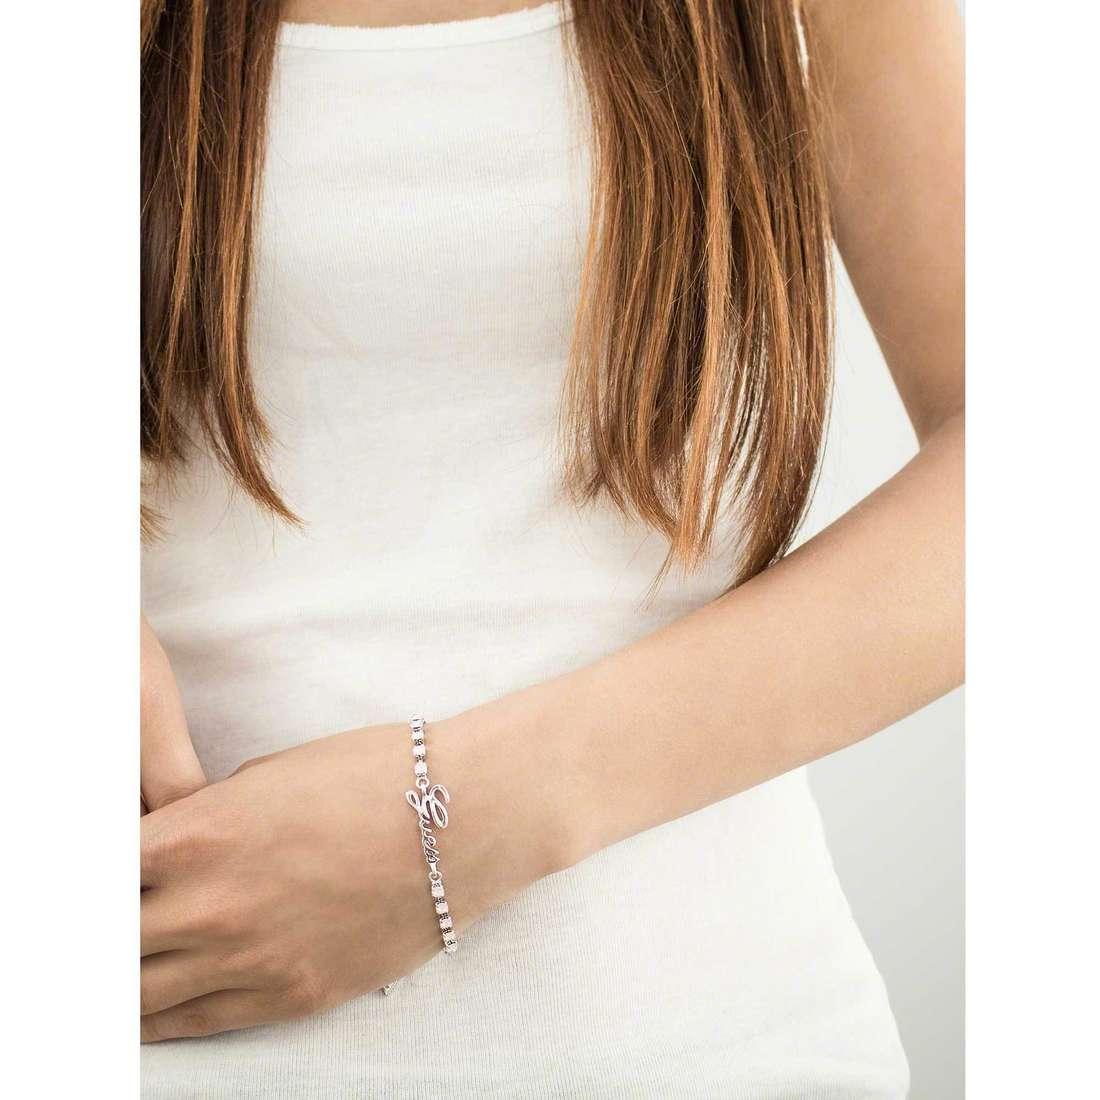 Guess bracelets femme UBB61086-S indosso